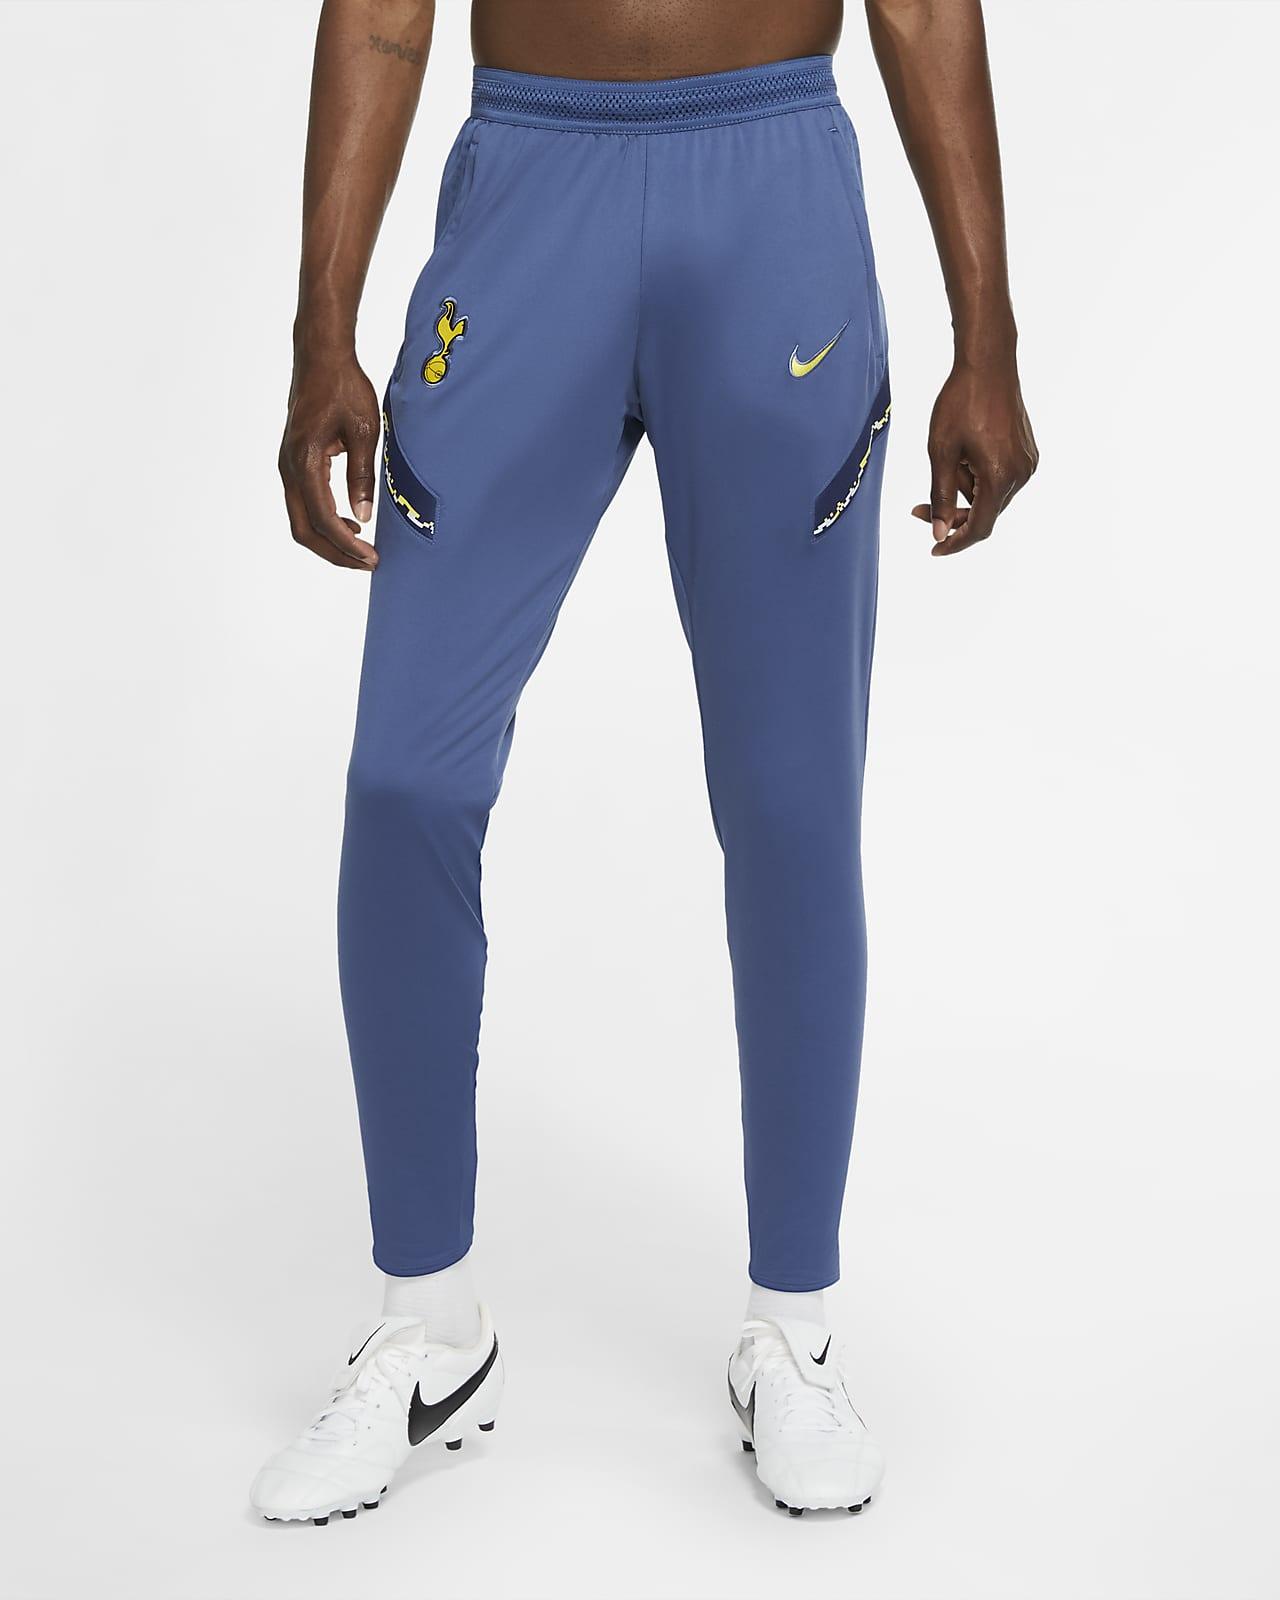 Tottenham Hotspur Strike Men's Knit Football Pants